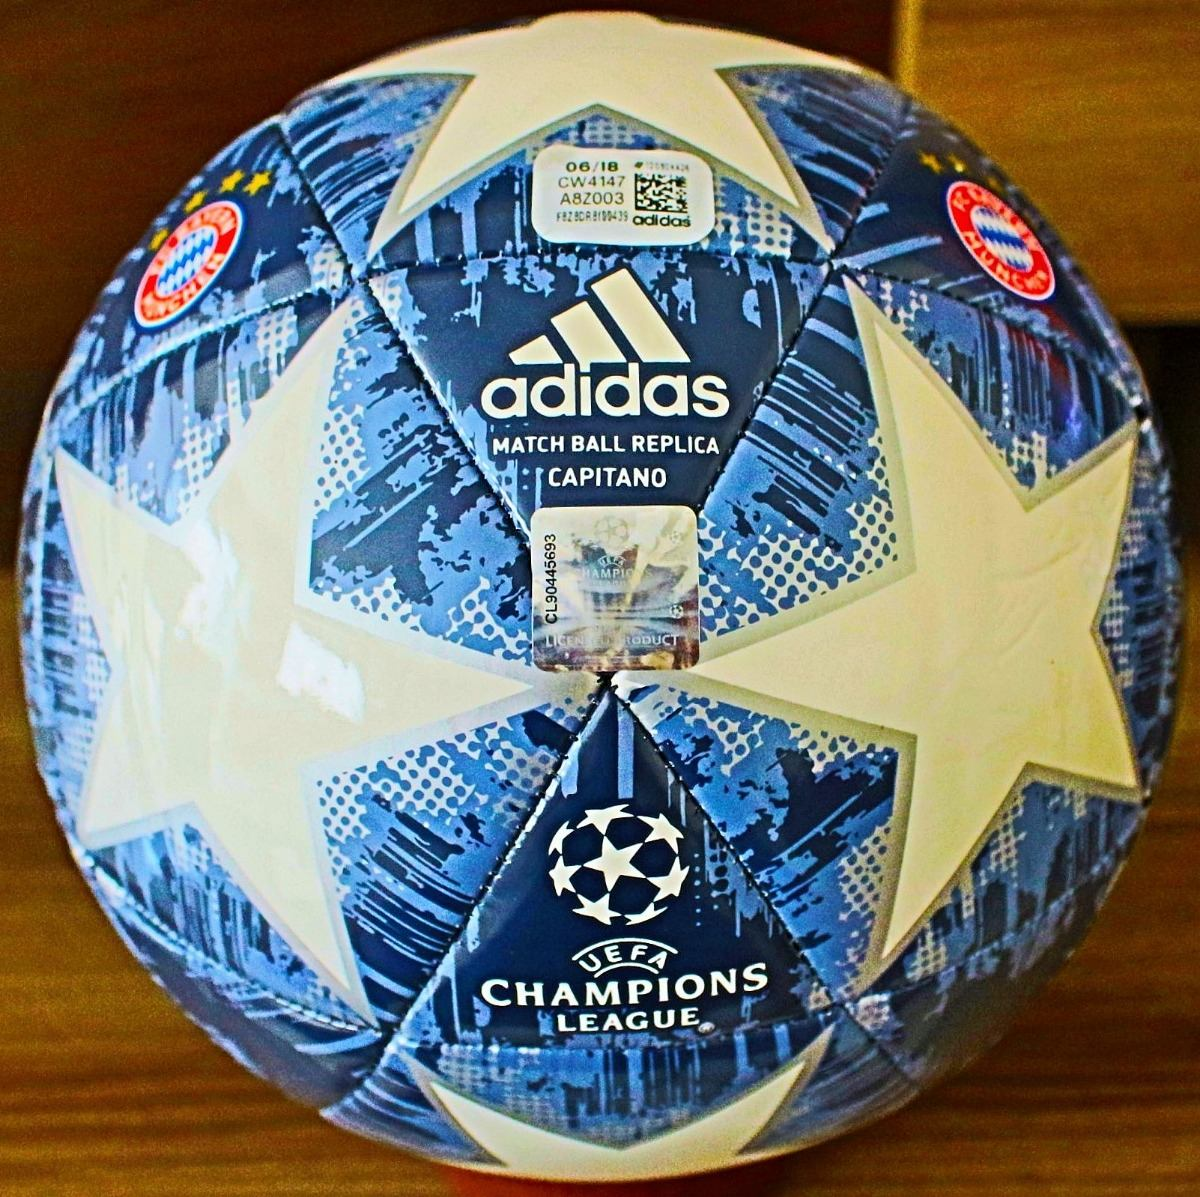 52eb5a27ea bola adidas champions league bayern tamanho oficial. Carregando zoom.